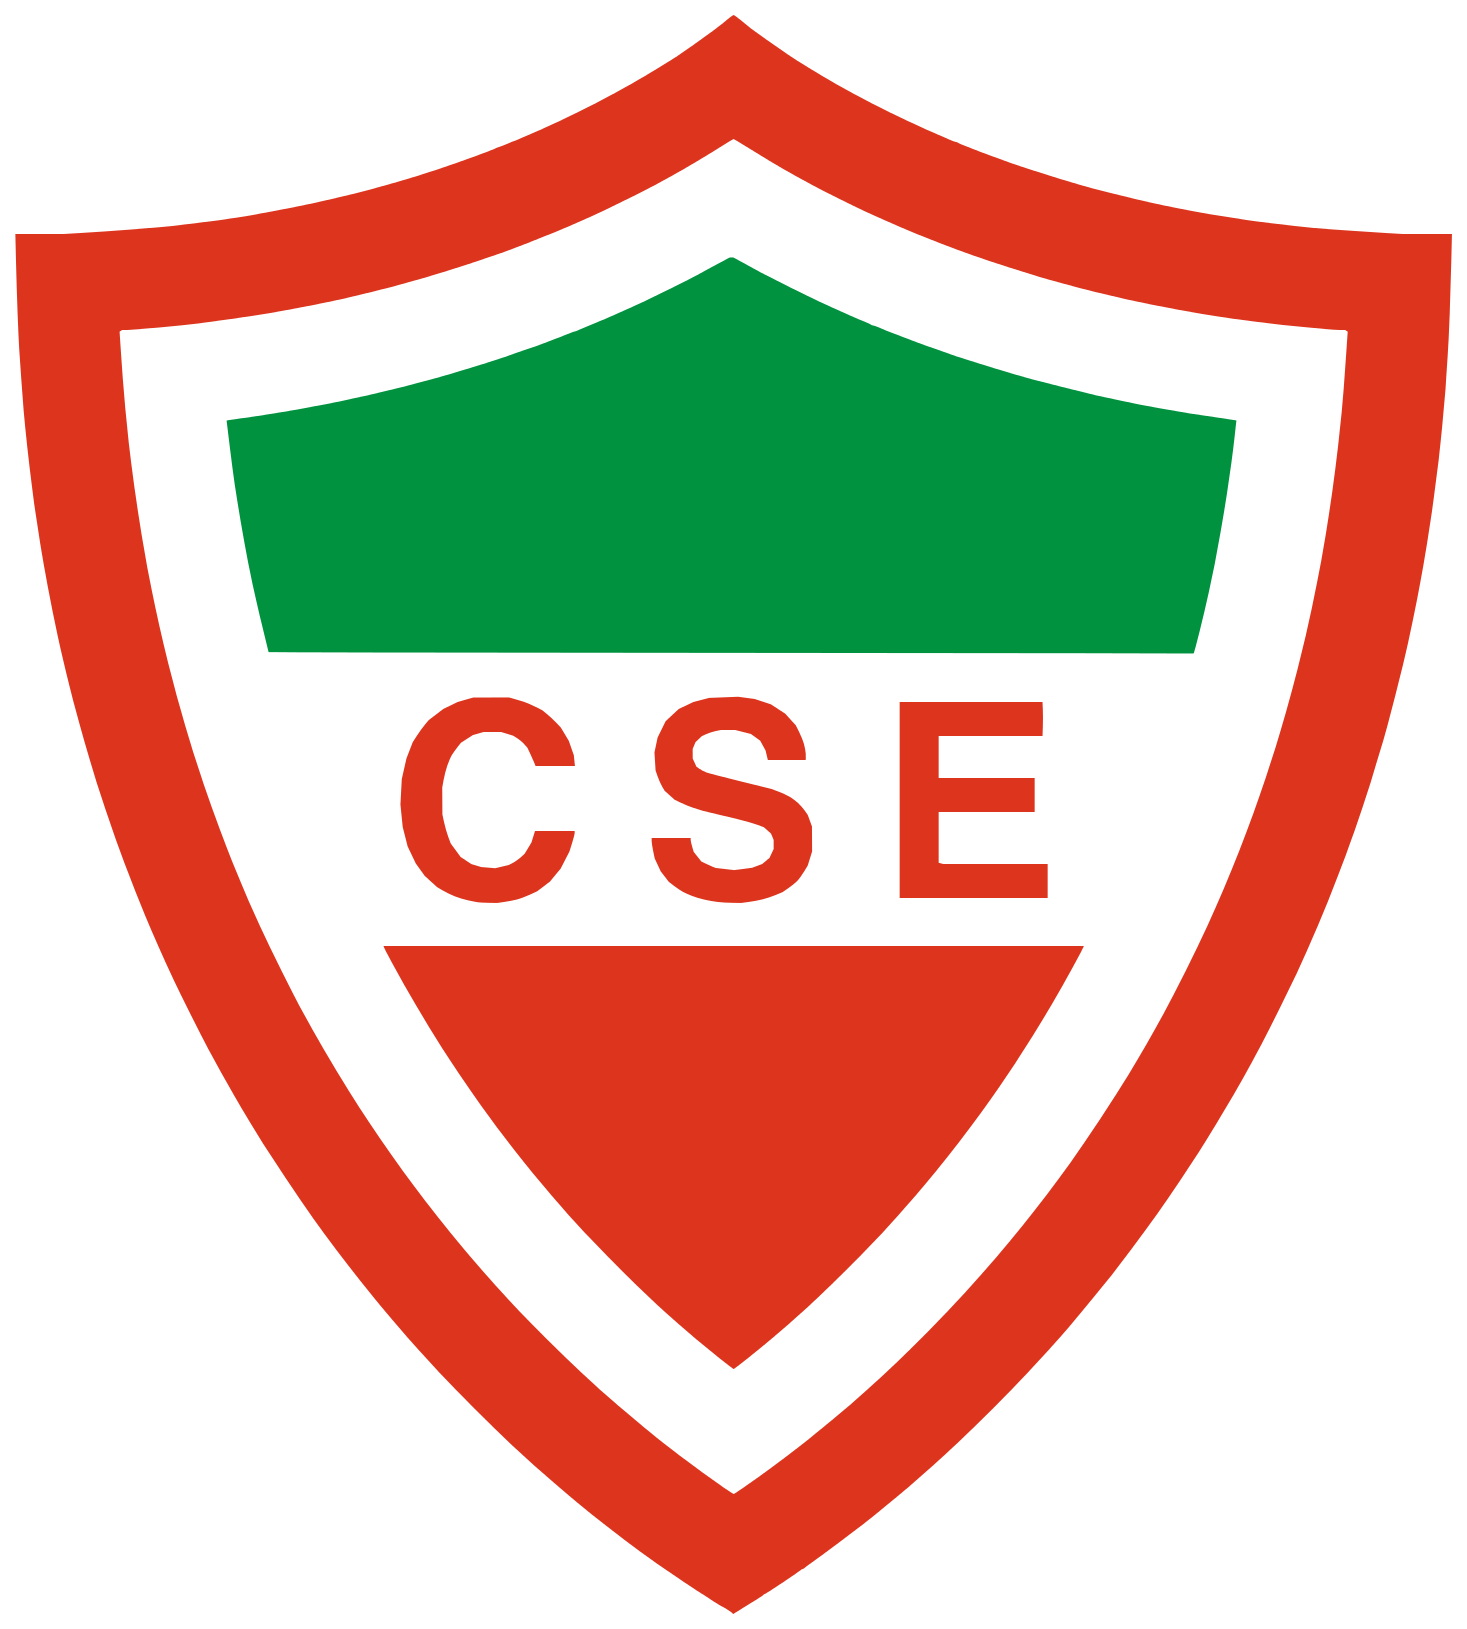 File:CSE logo.svg.